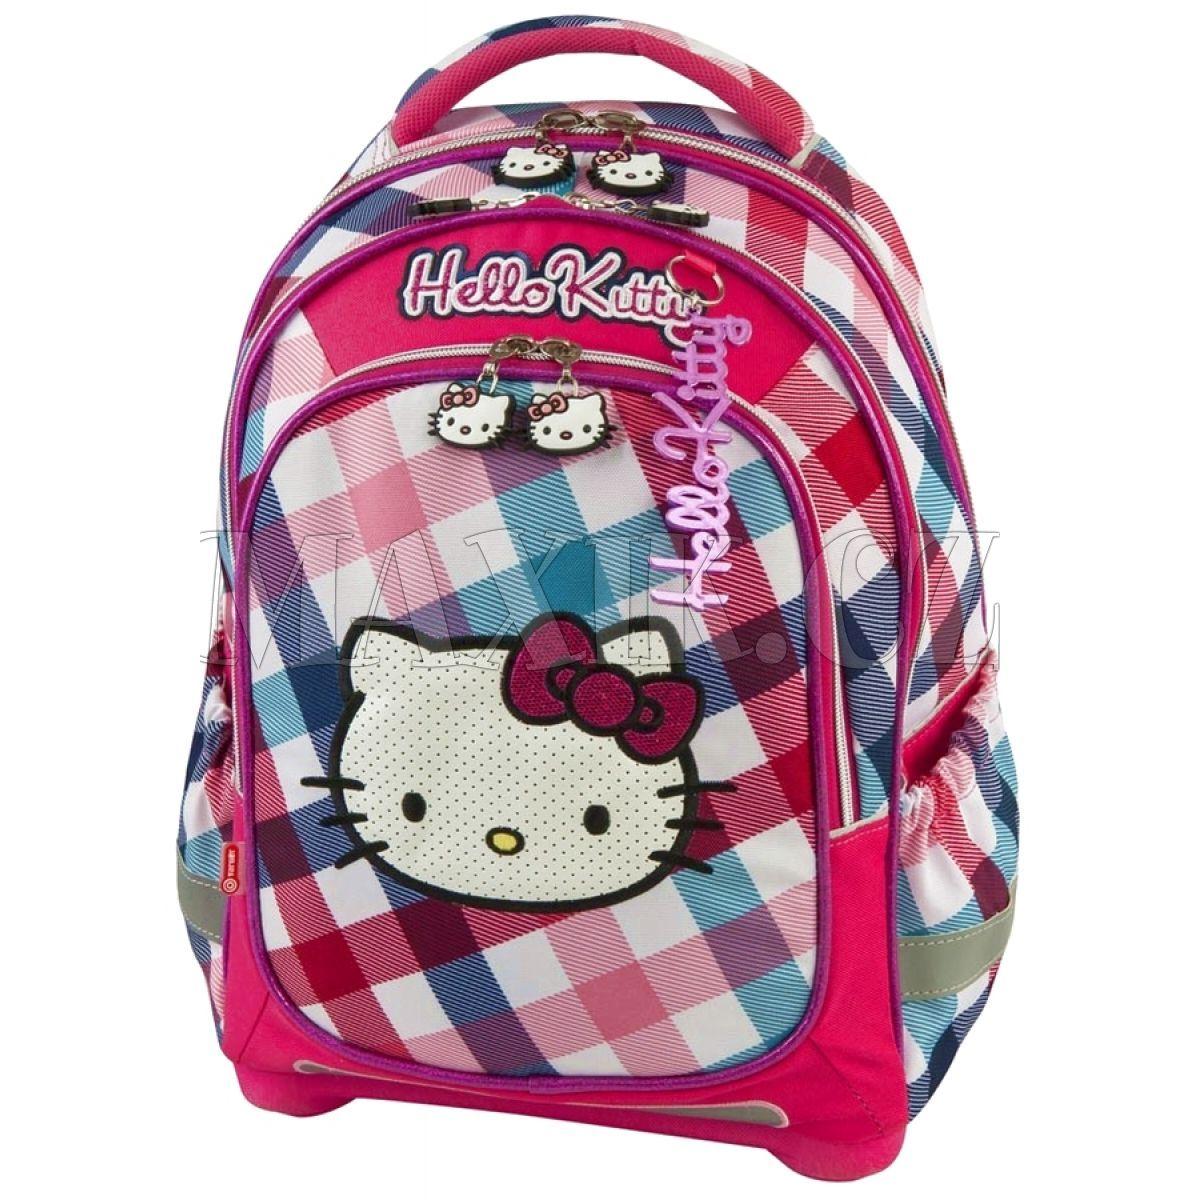 Target Batoh Hello Kitty růžovo světle modrý  6d59701999